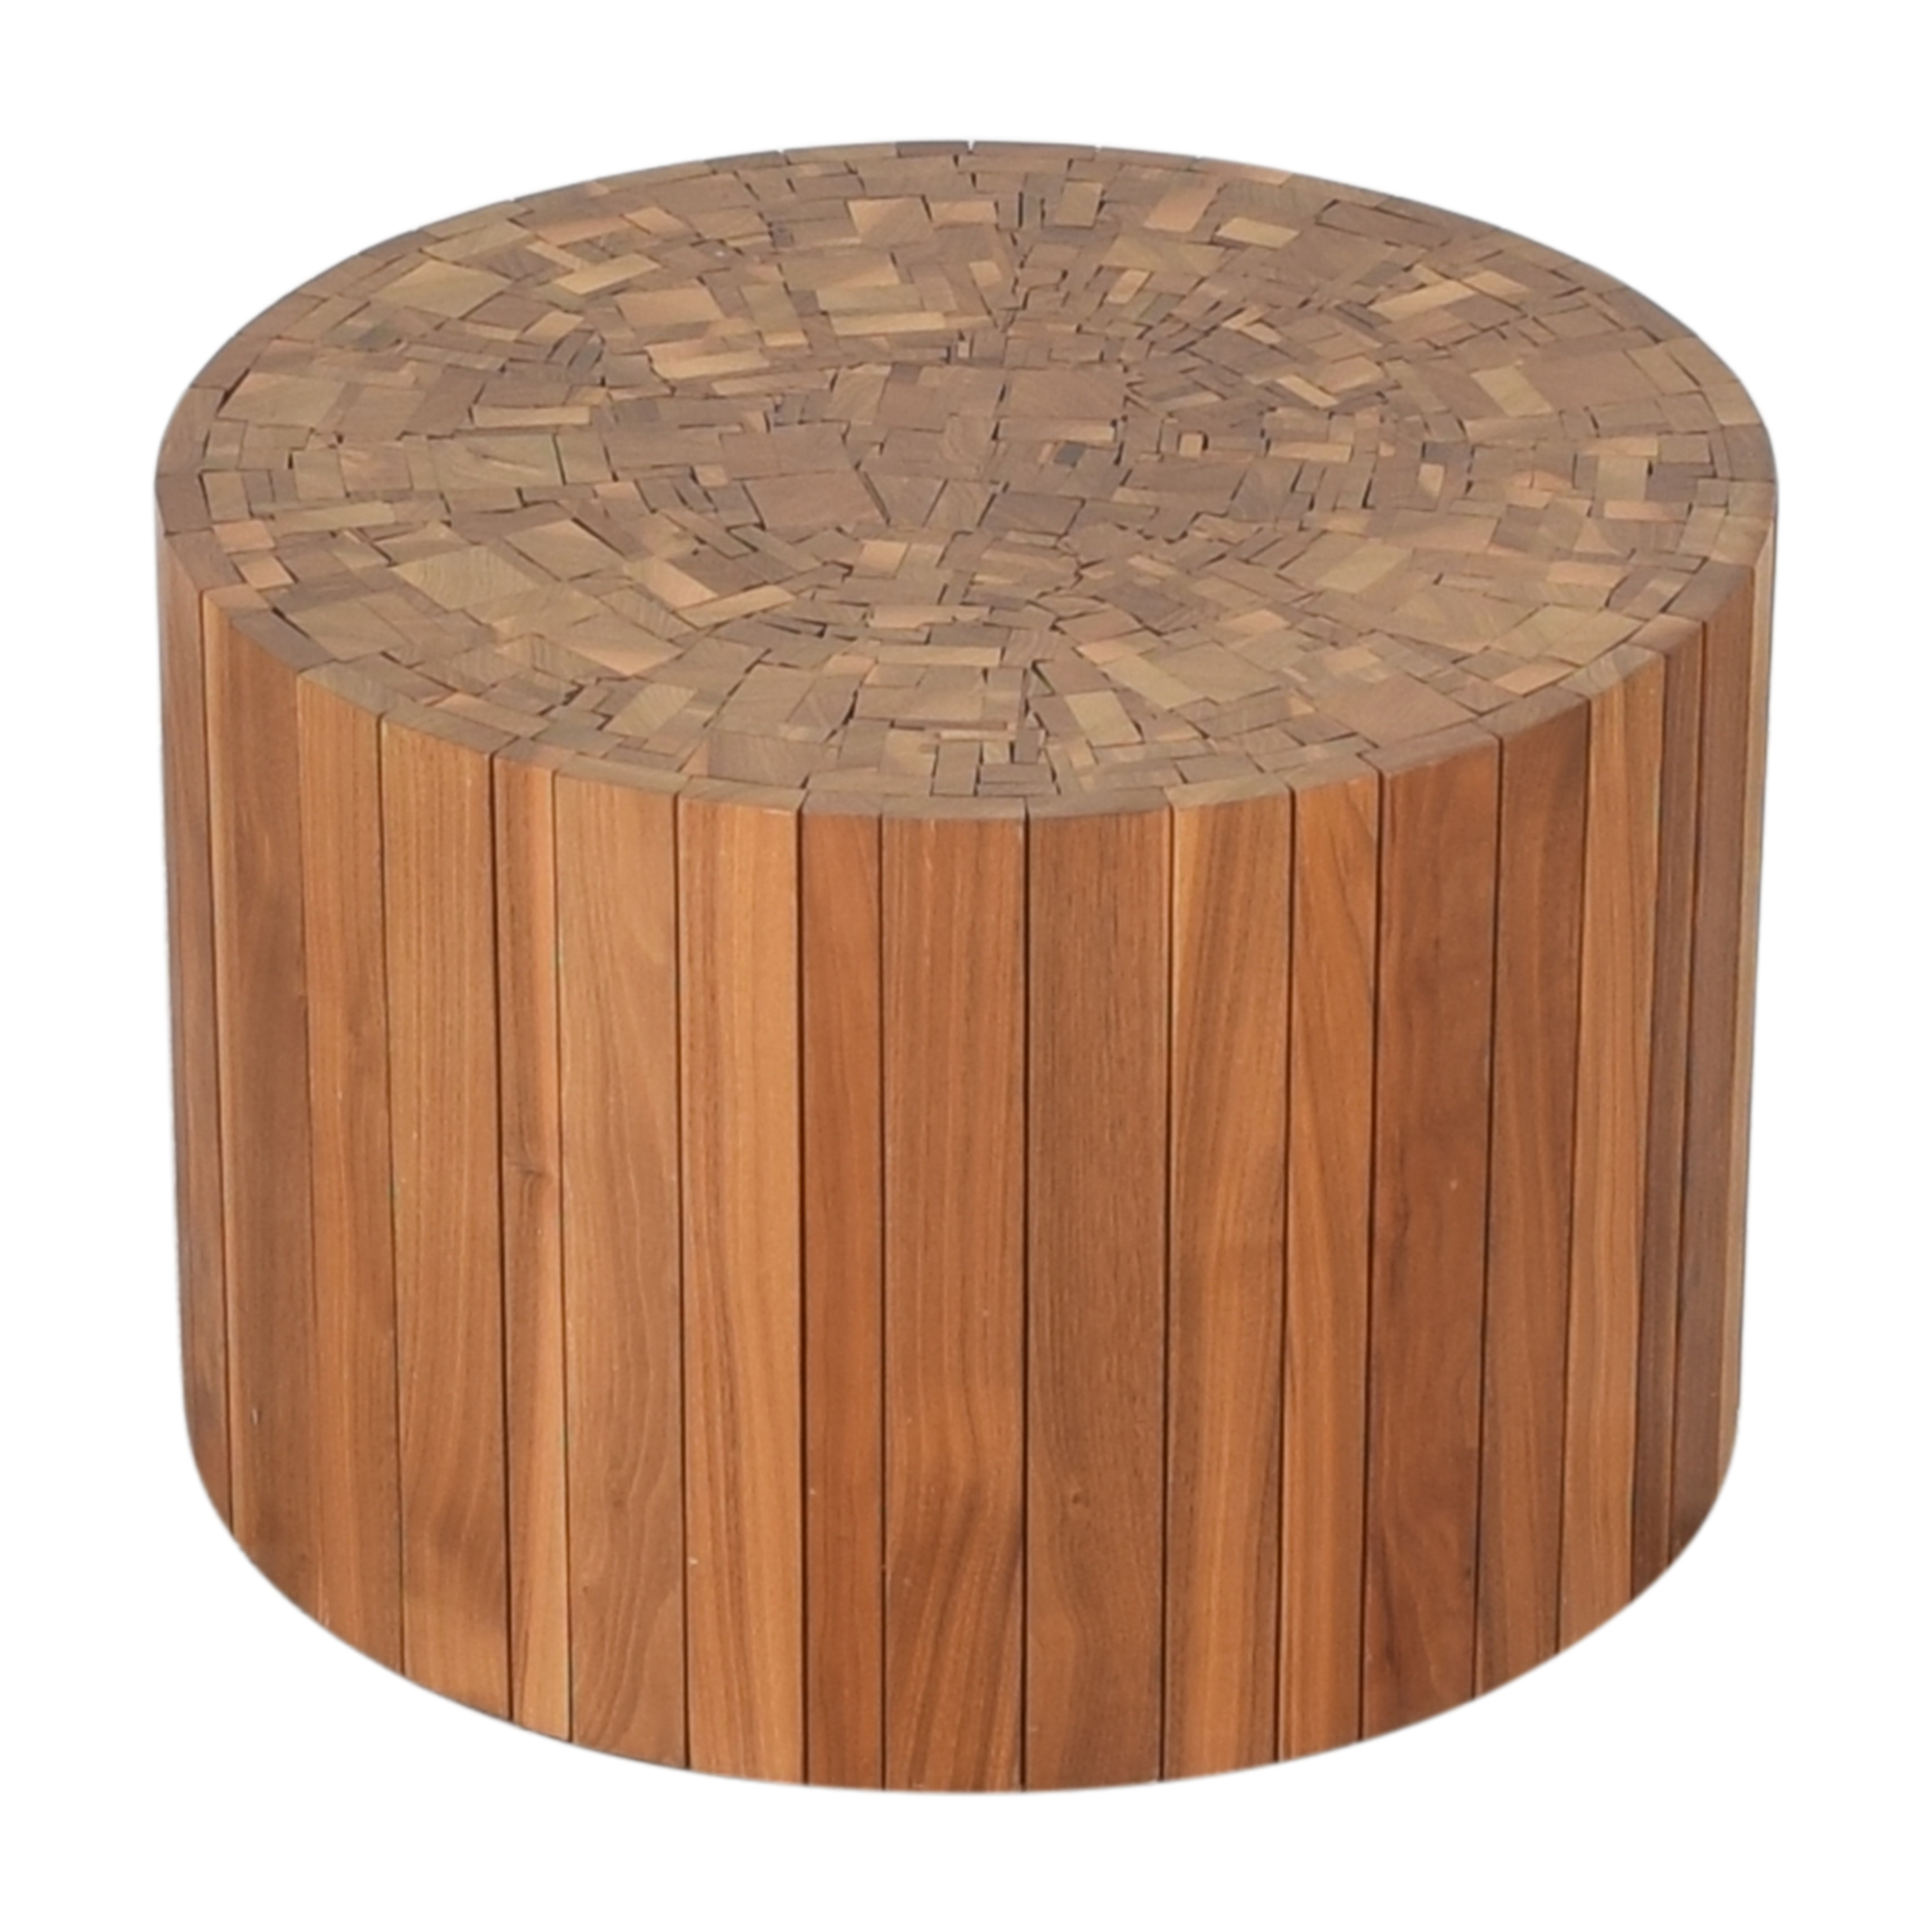 Uhuru Design Uhuru Design Stoolen Coffee Table price